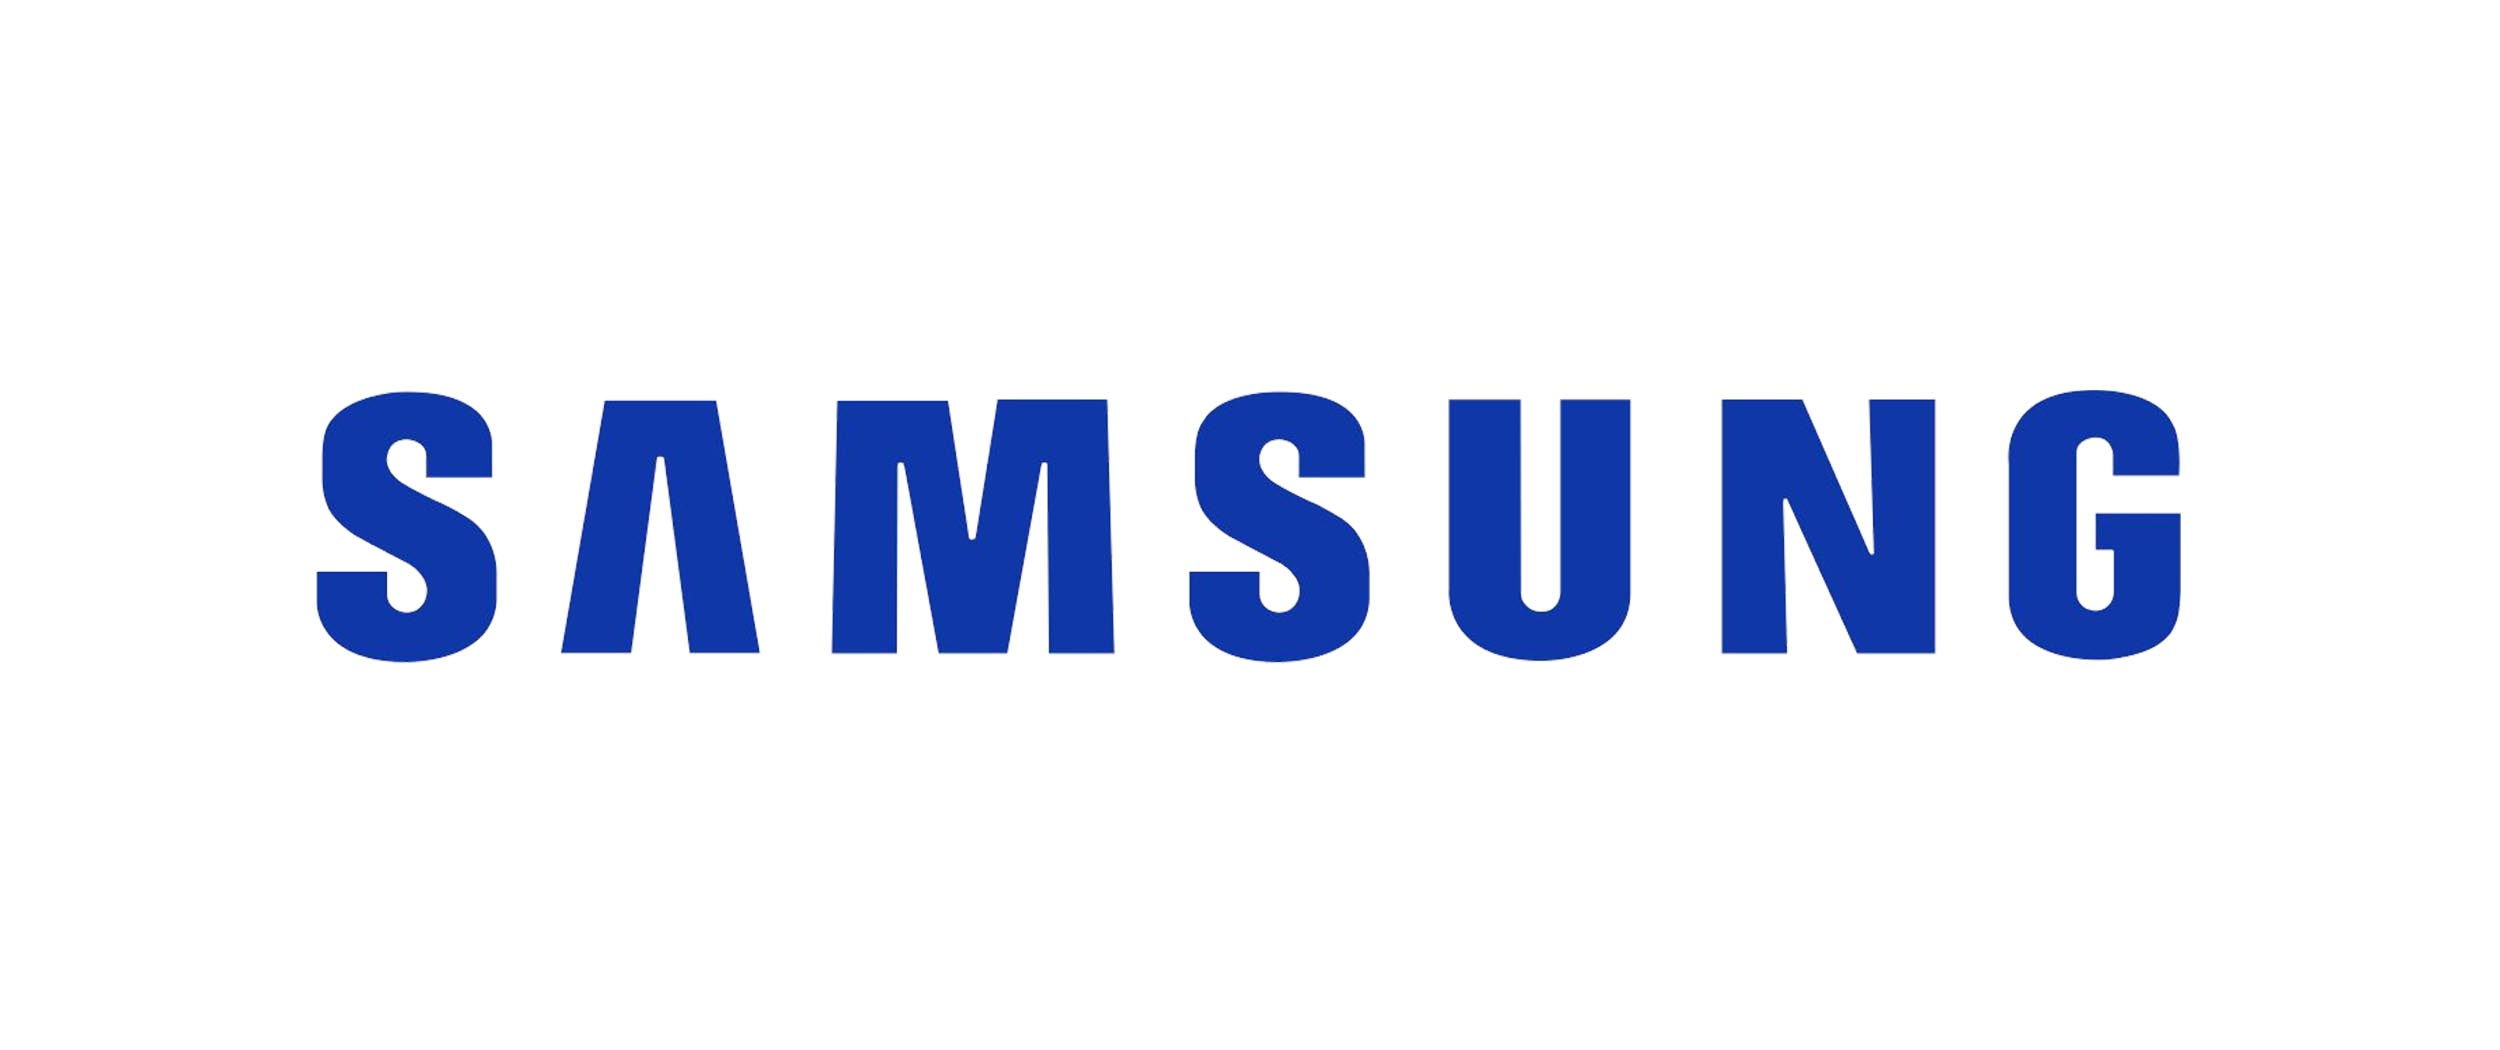 9 Samsung.jpg